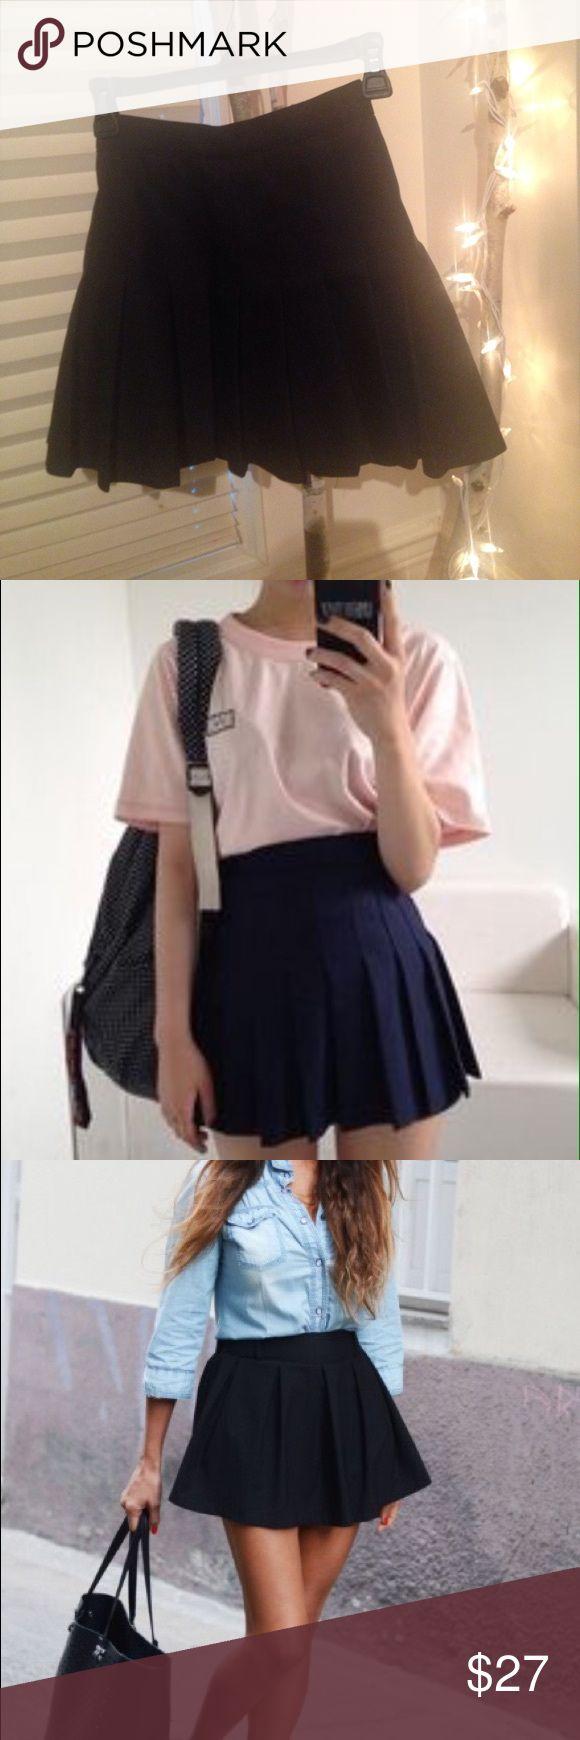 Selling this American Apparel Tennis Skirt on Poshmark! My username is: nancy0023. #shopmycloset #poshmark #fashion #shopping #style #forsale #American Apparel #Dresses & Skirts